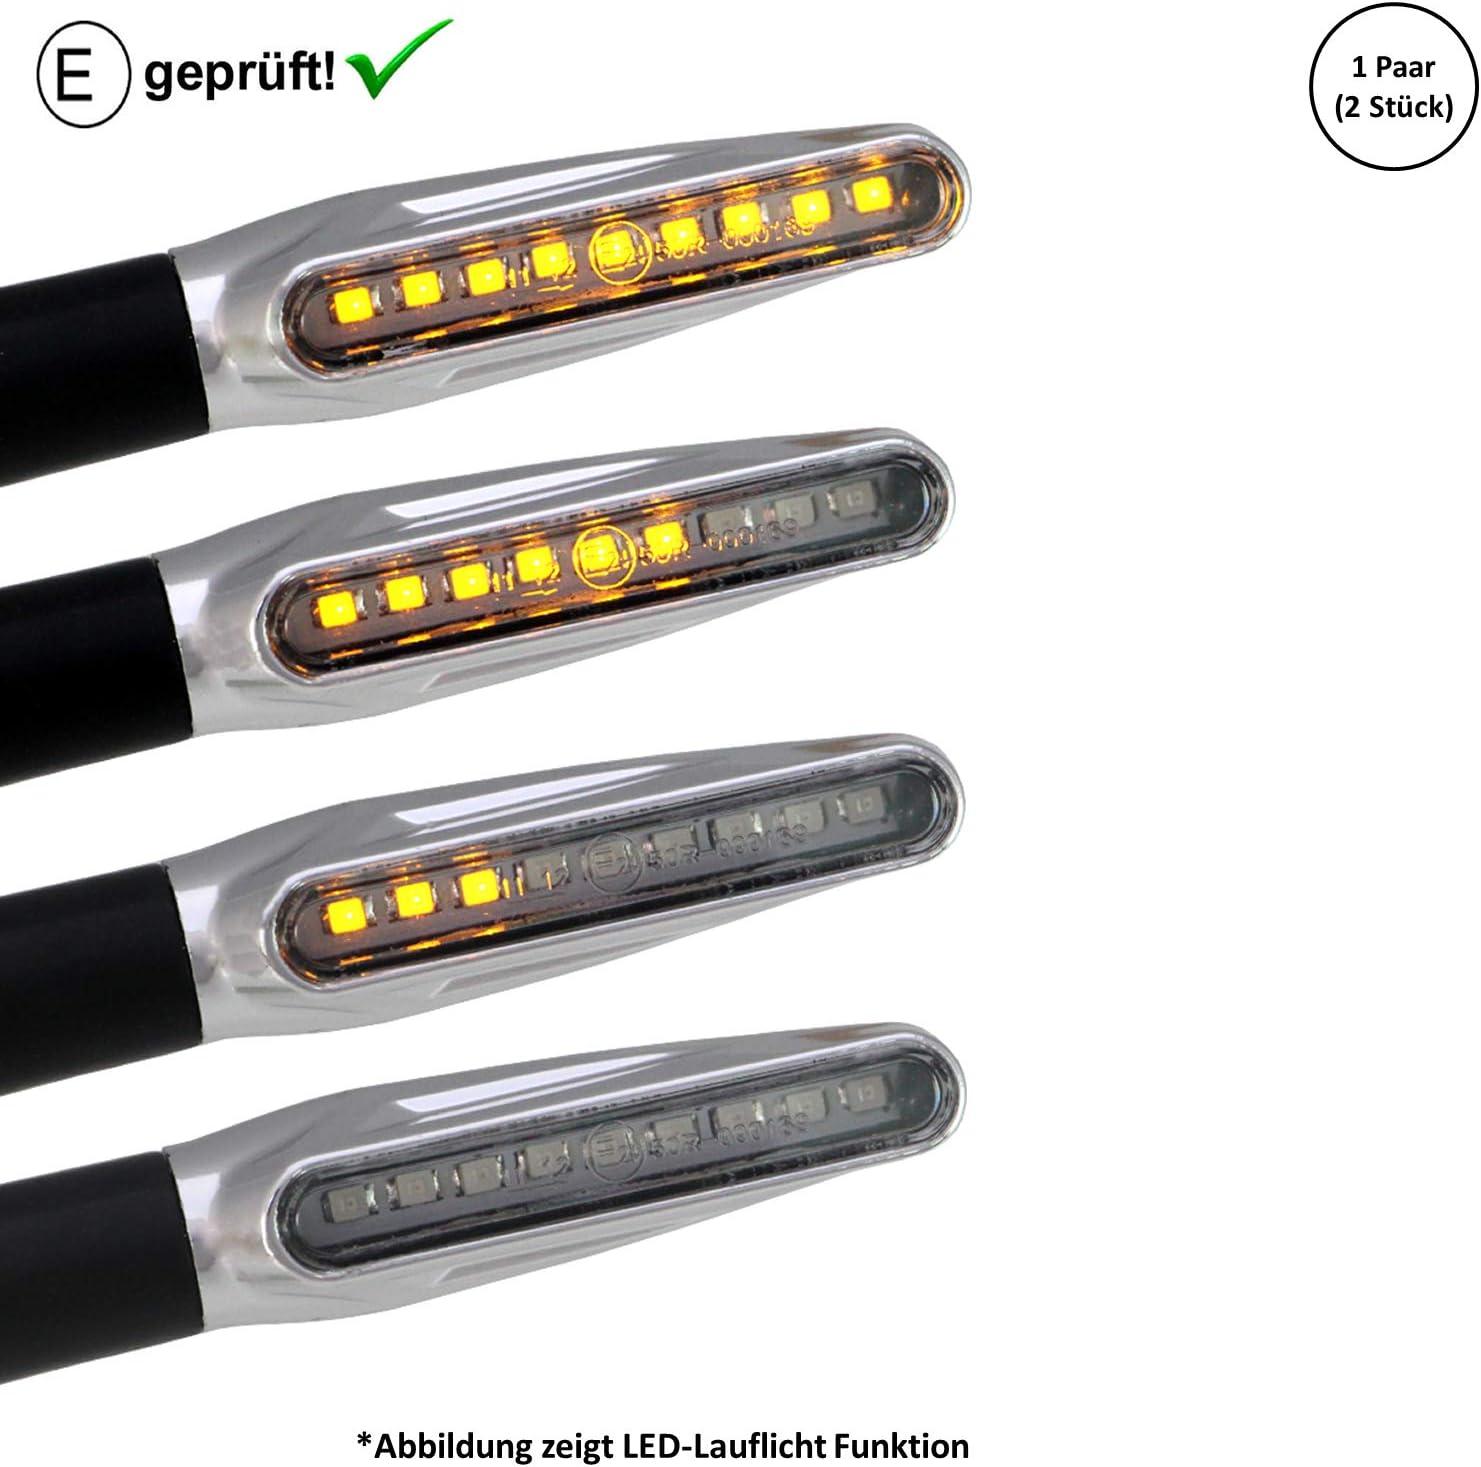 LED Blinker kompatibel mit Honda VTX 1800 E-Gepr/üft // 2St/ück B16 VTX 1300 // X-Eleven 1100